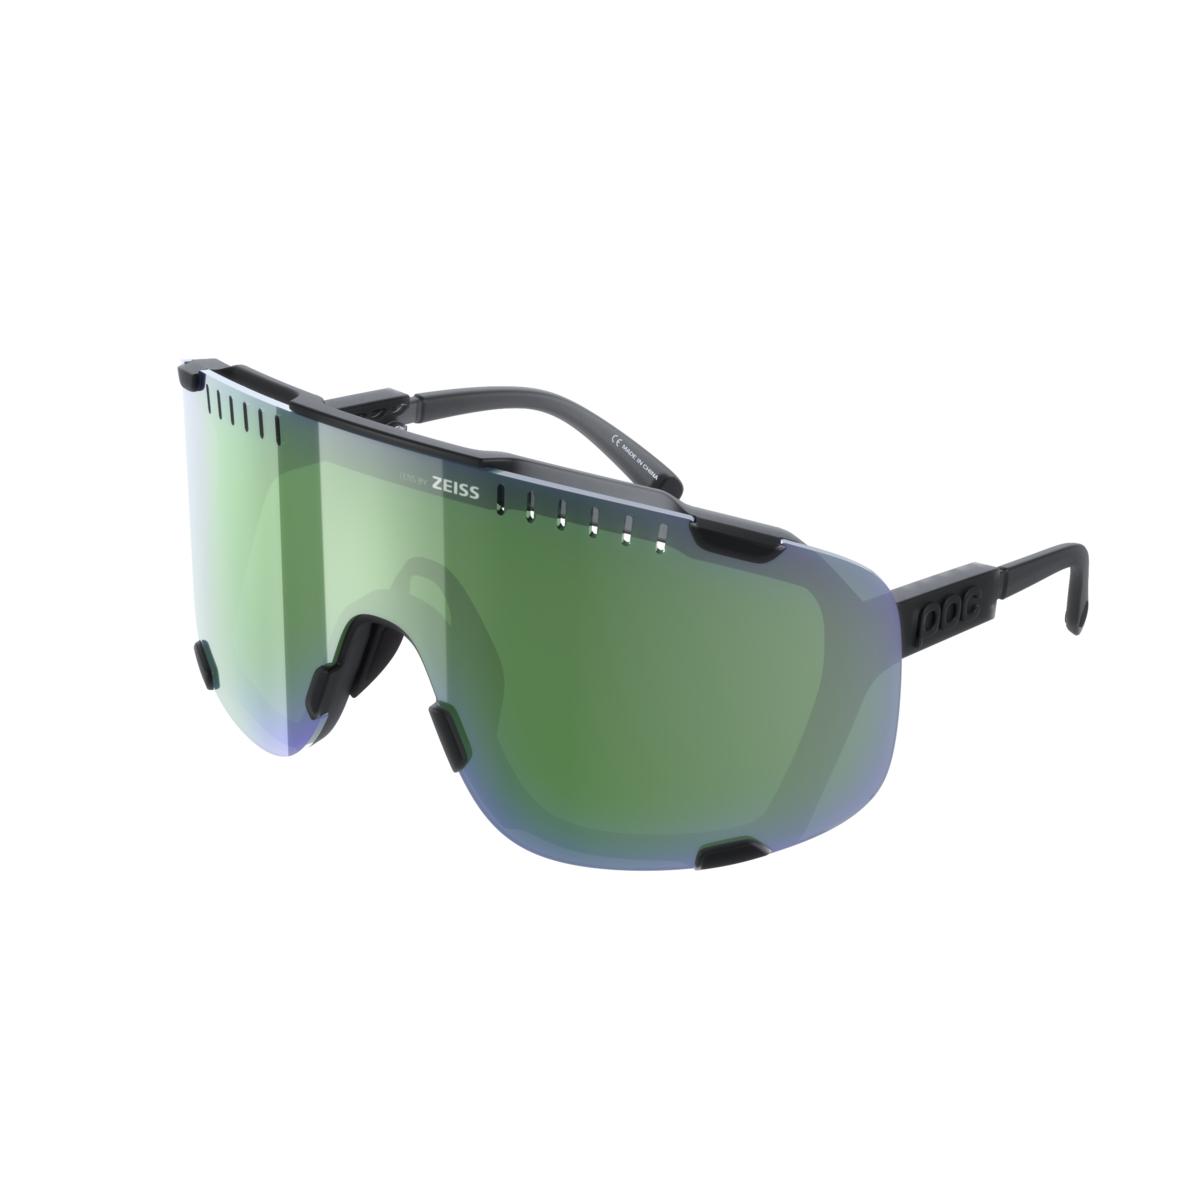 Occhiali Devour Black Translucent lente clarity GDG